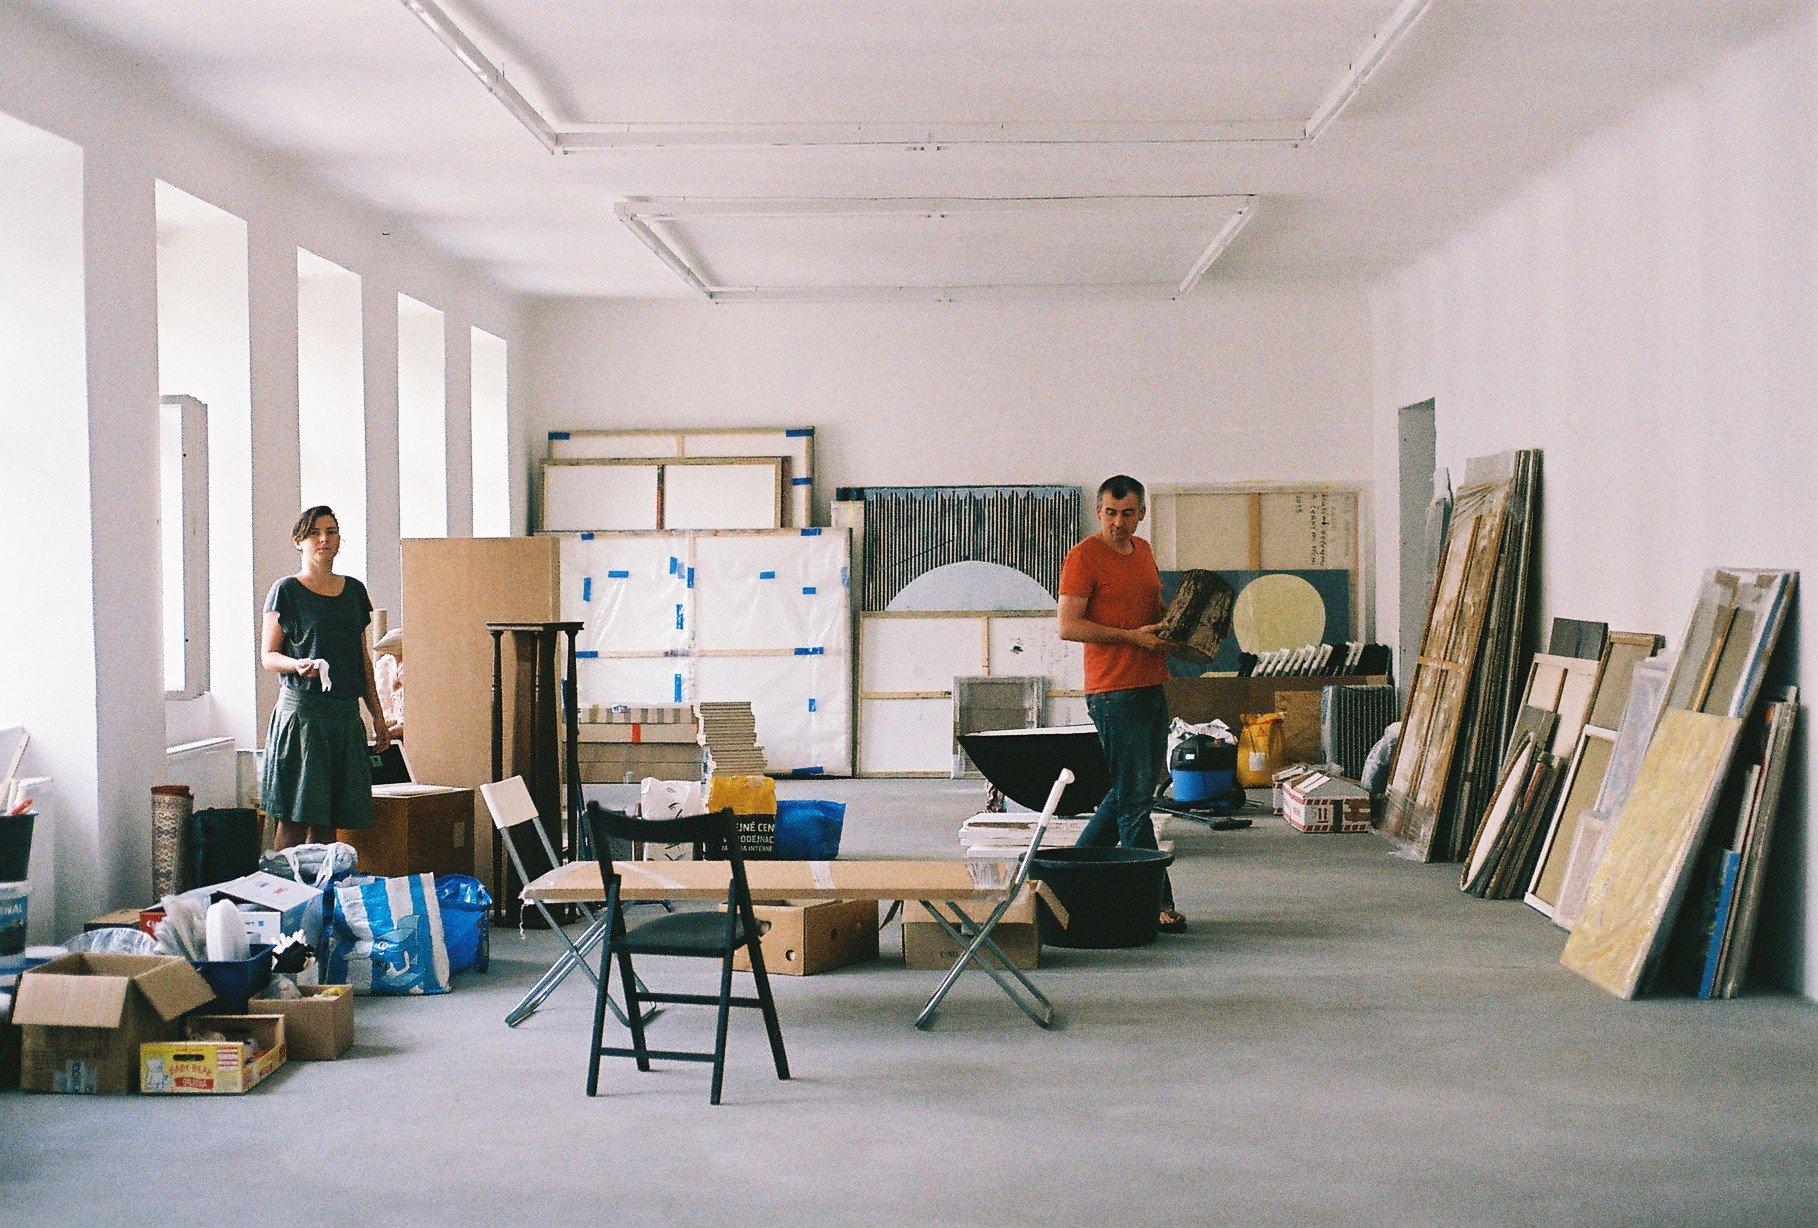 Galeria SVIT, Praga, nazdjęci Zuzana Blochova iMichal Mánek